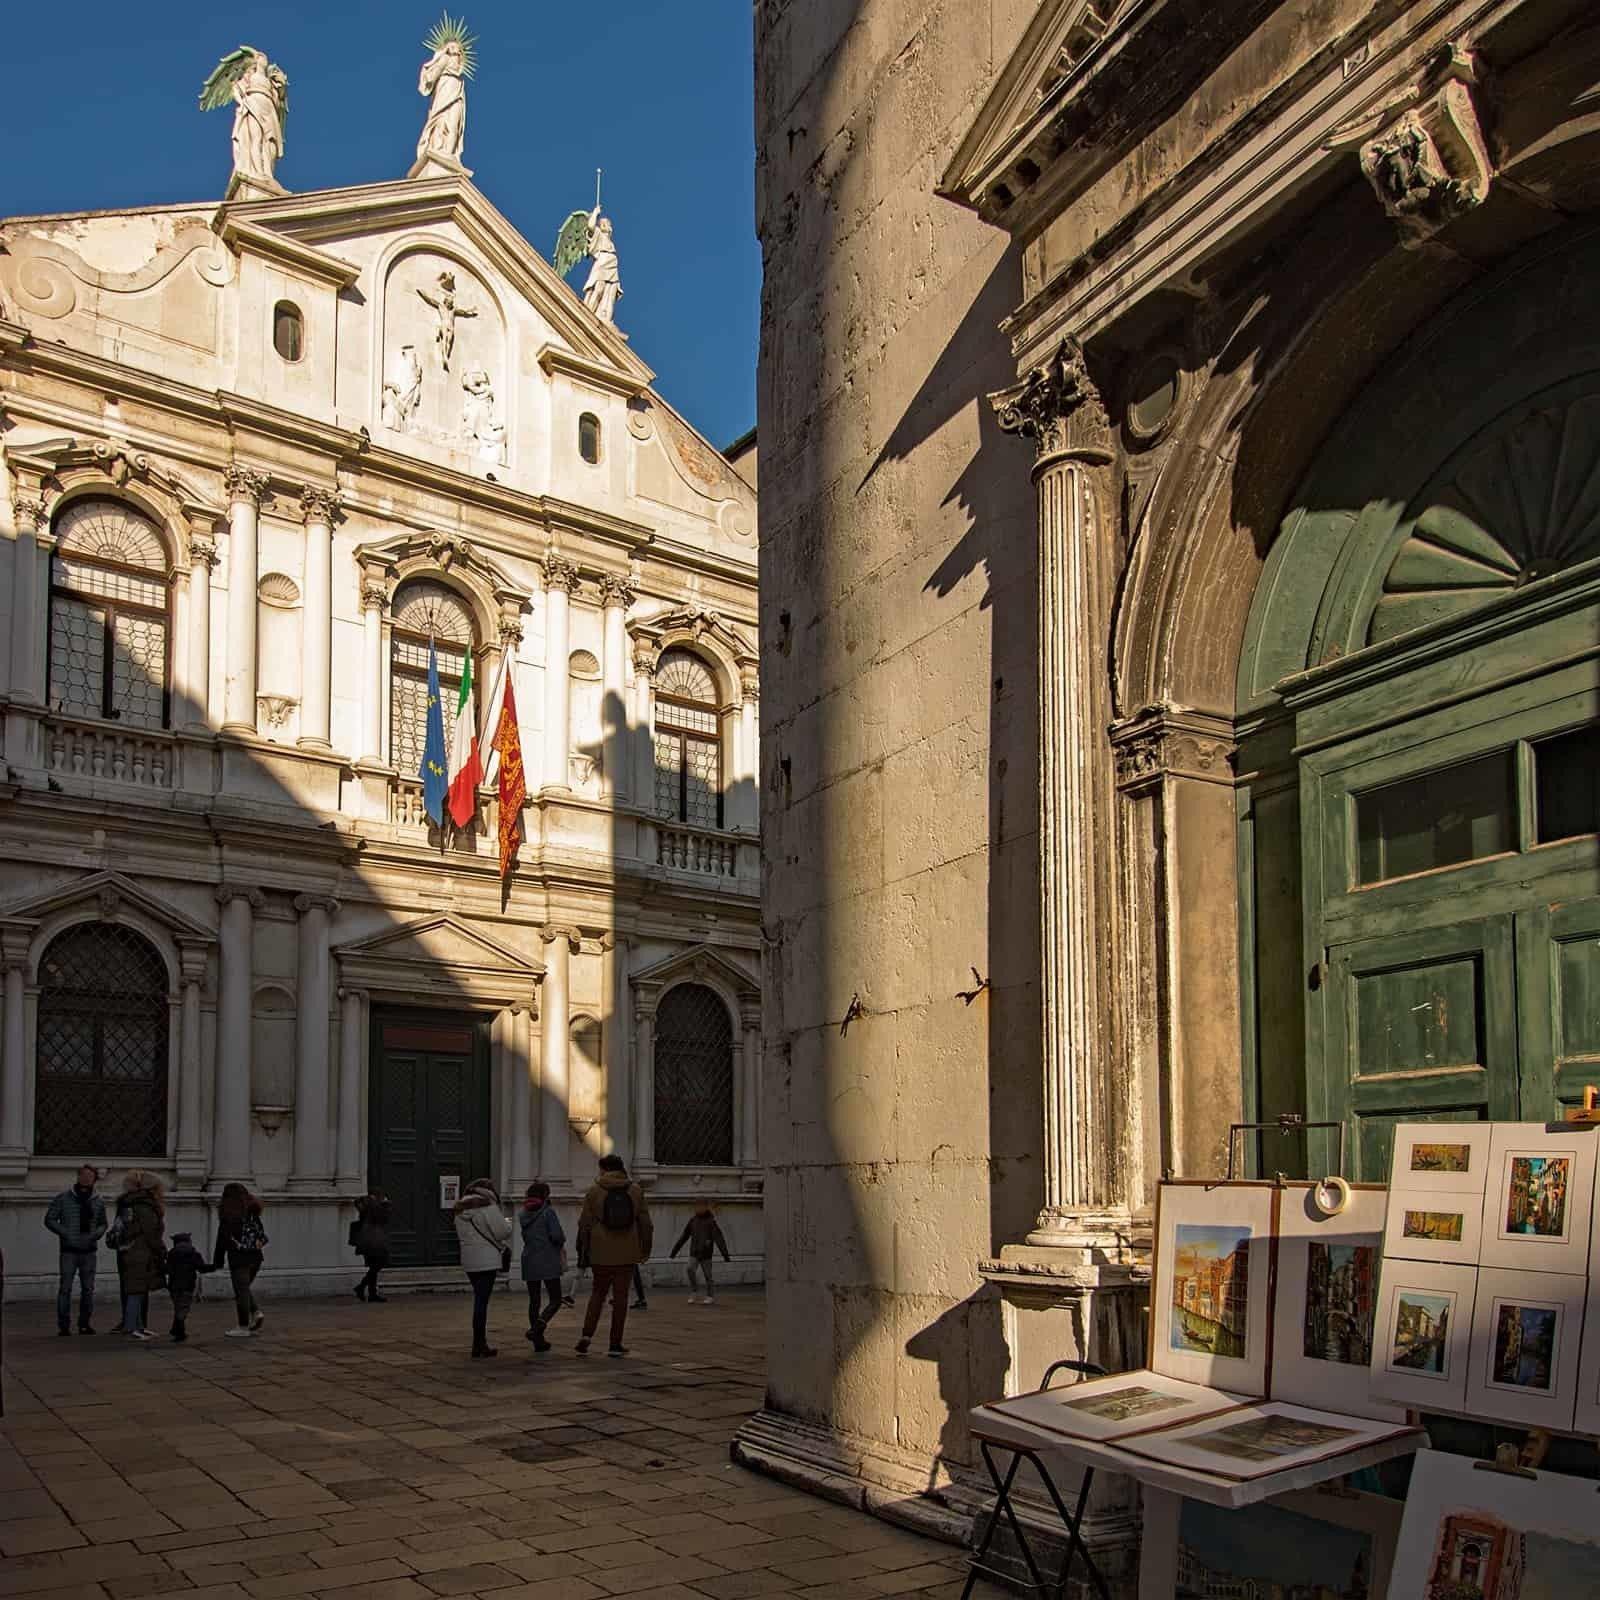 Musikreise Venedig (3 Tage), Teatro La Fenice • Tagesprogramm deutsch • m24o